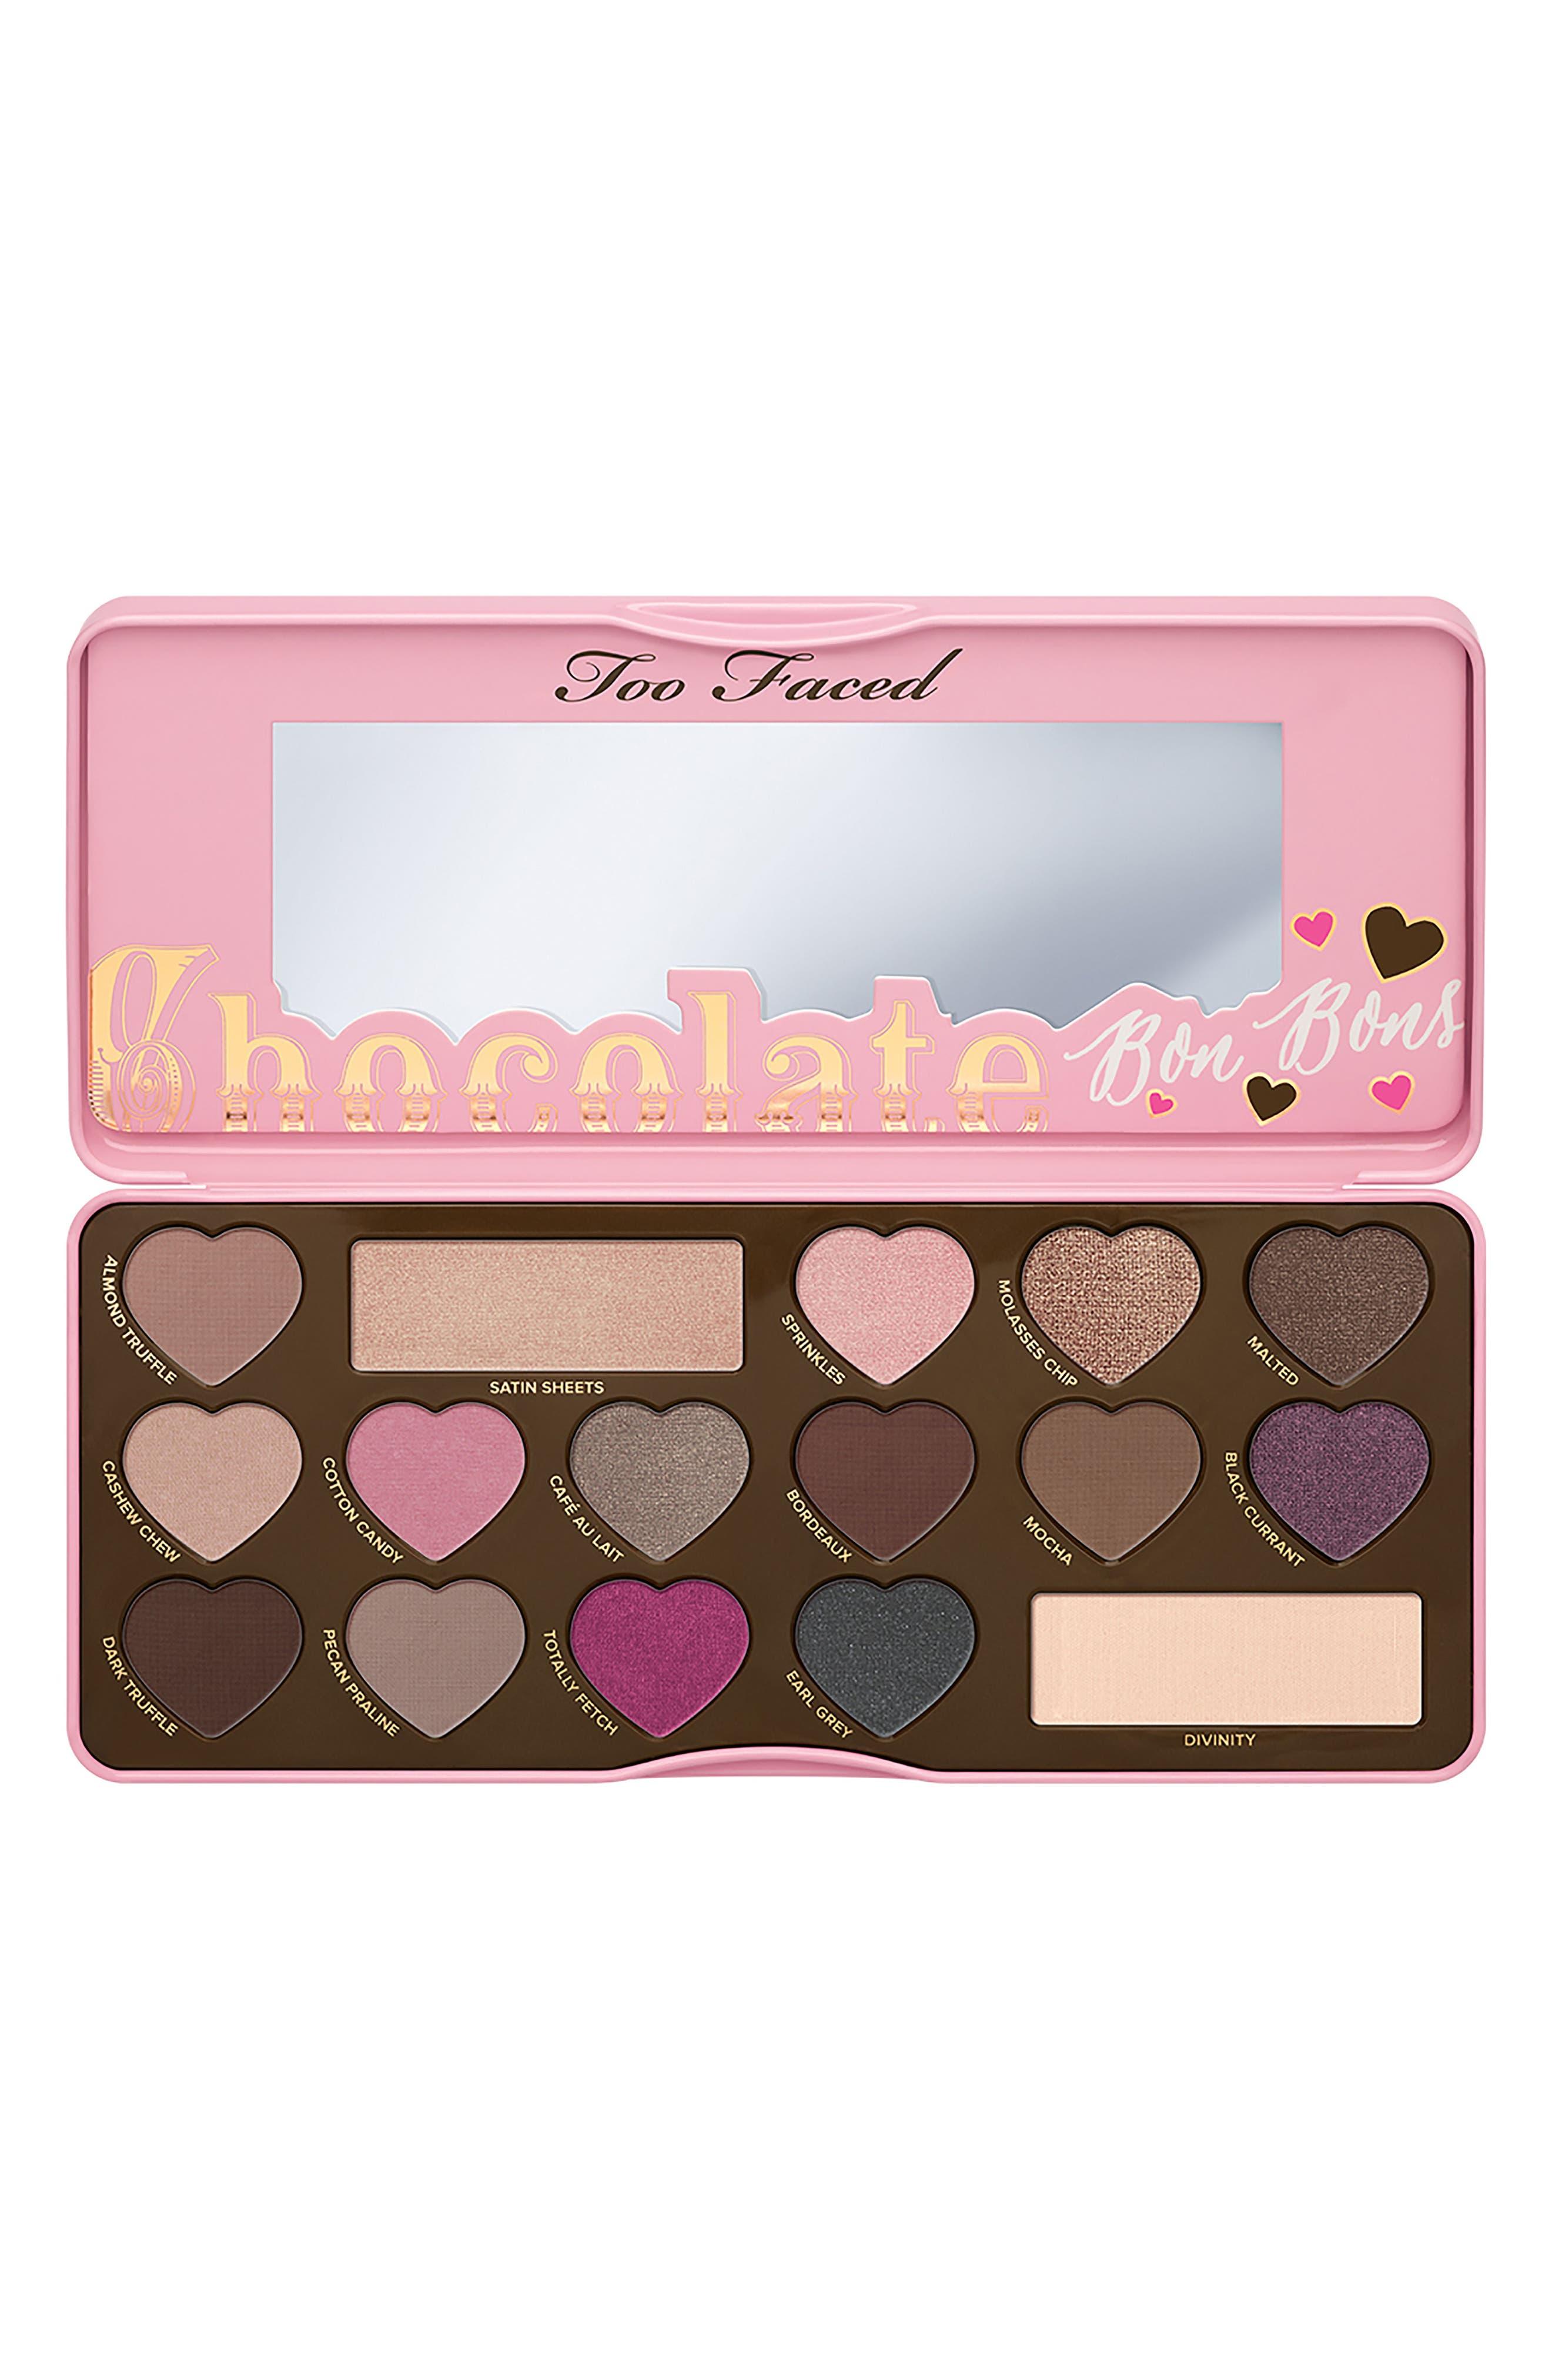 Chocolate Bon Bons Eyeshadow Palette,                             Alternate thumbnail 4, color,                             No Color